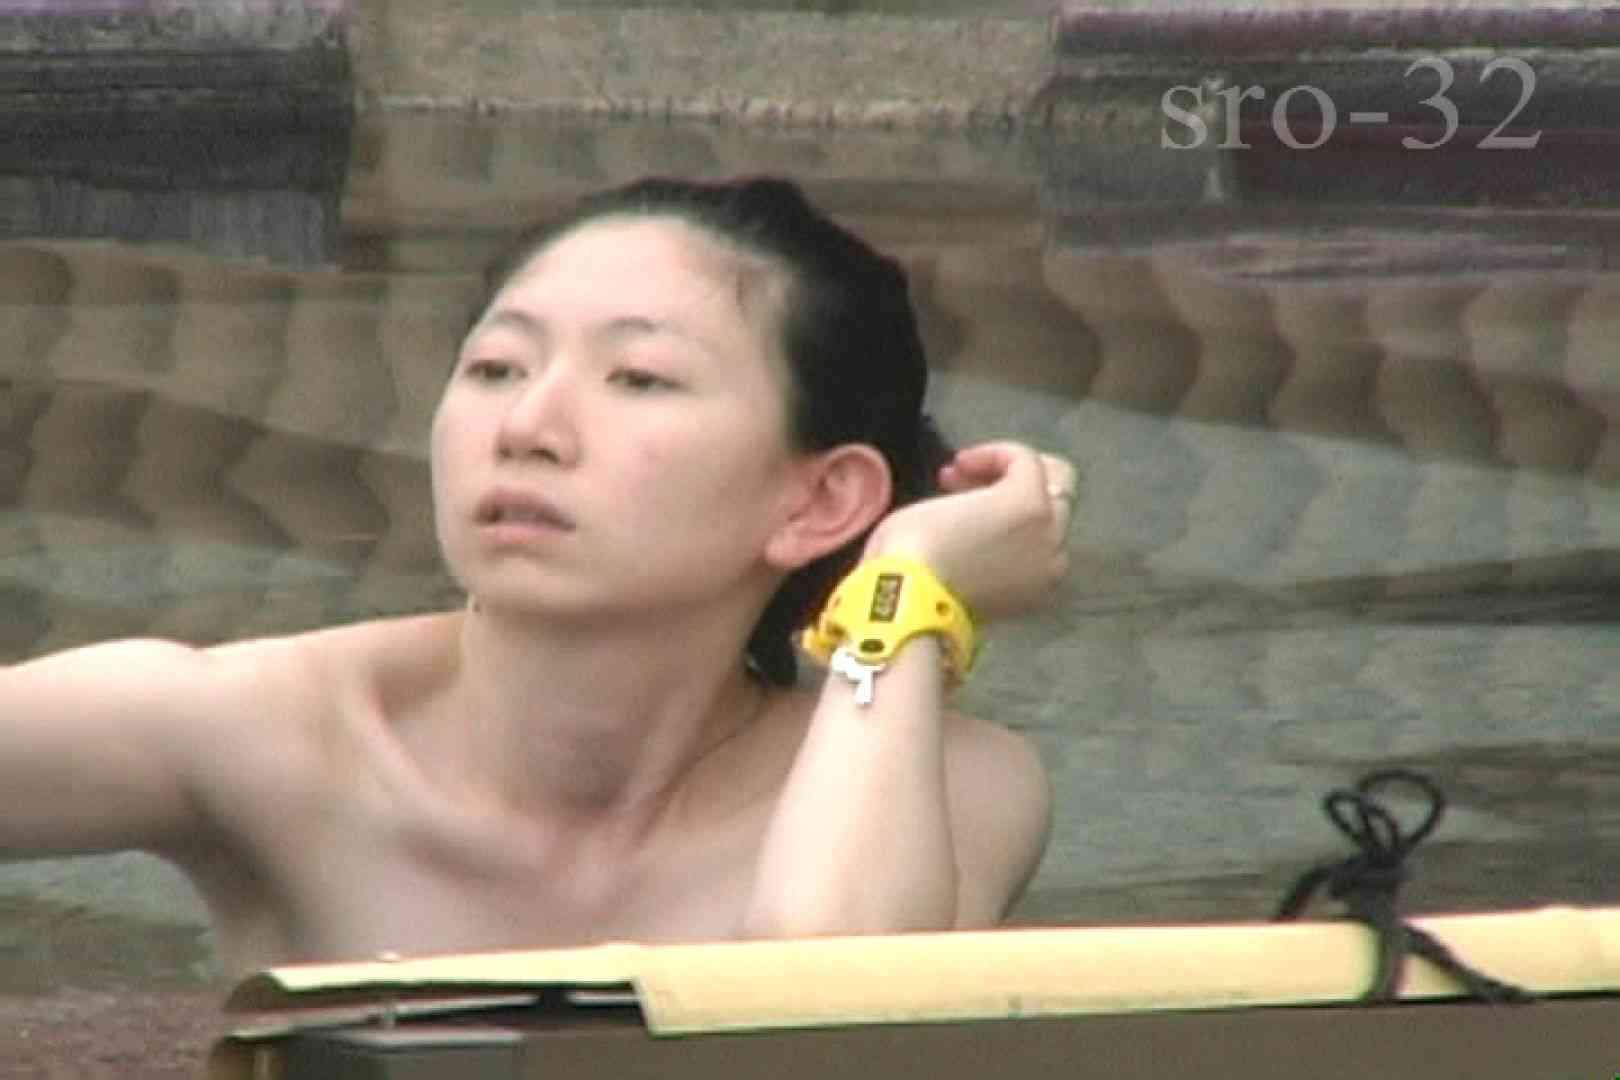 真・露天旅情 三十二番湯 Hな熟女 ワレメ無修正動画無料 101pic 29